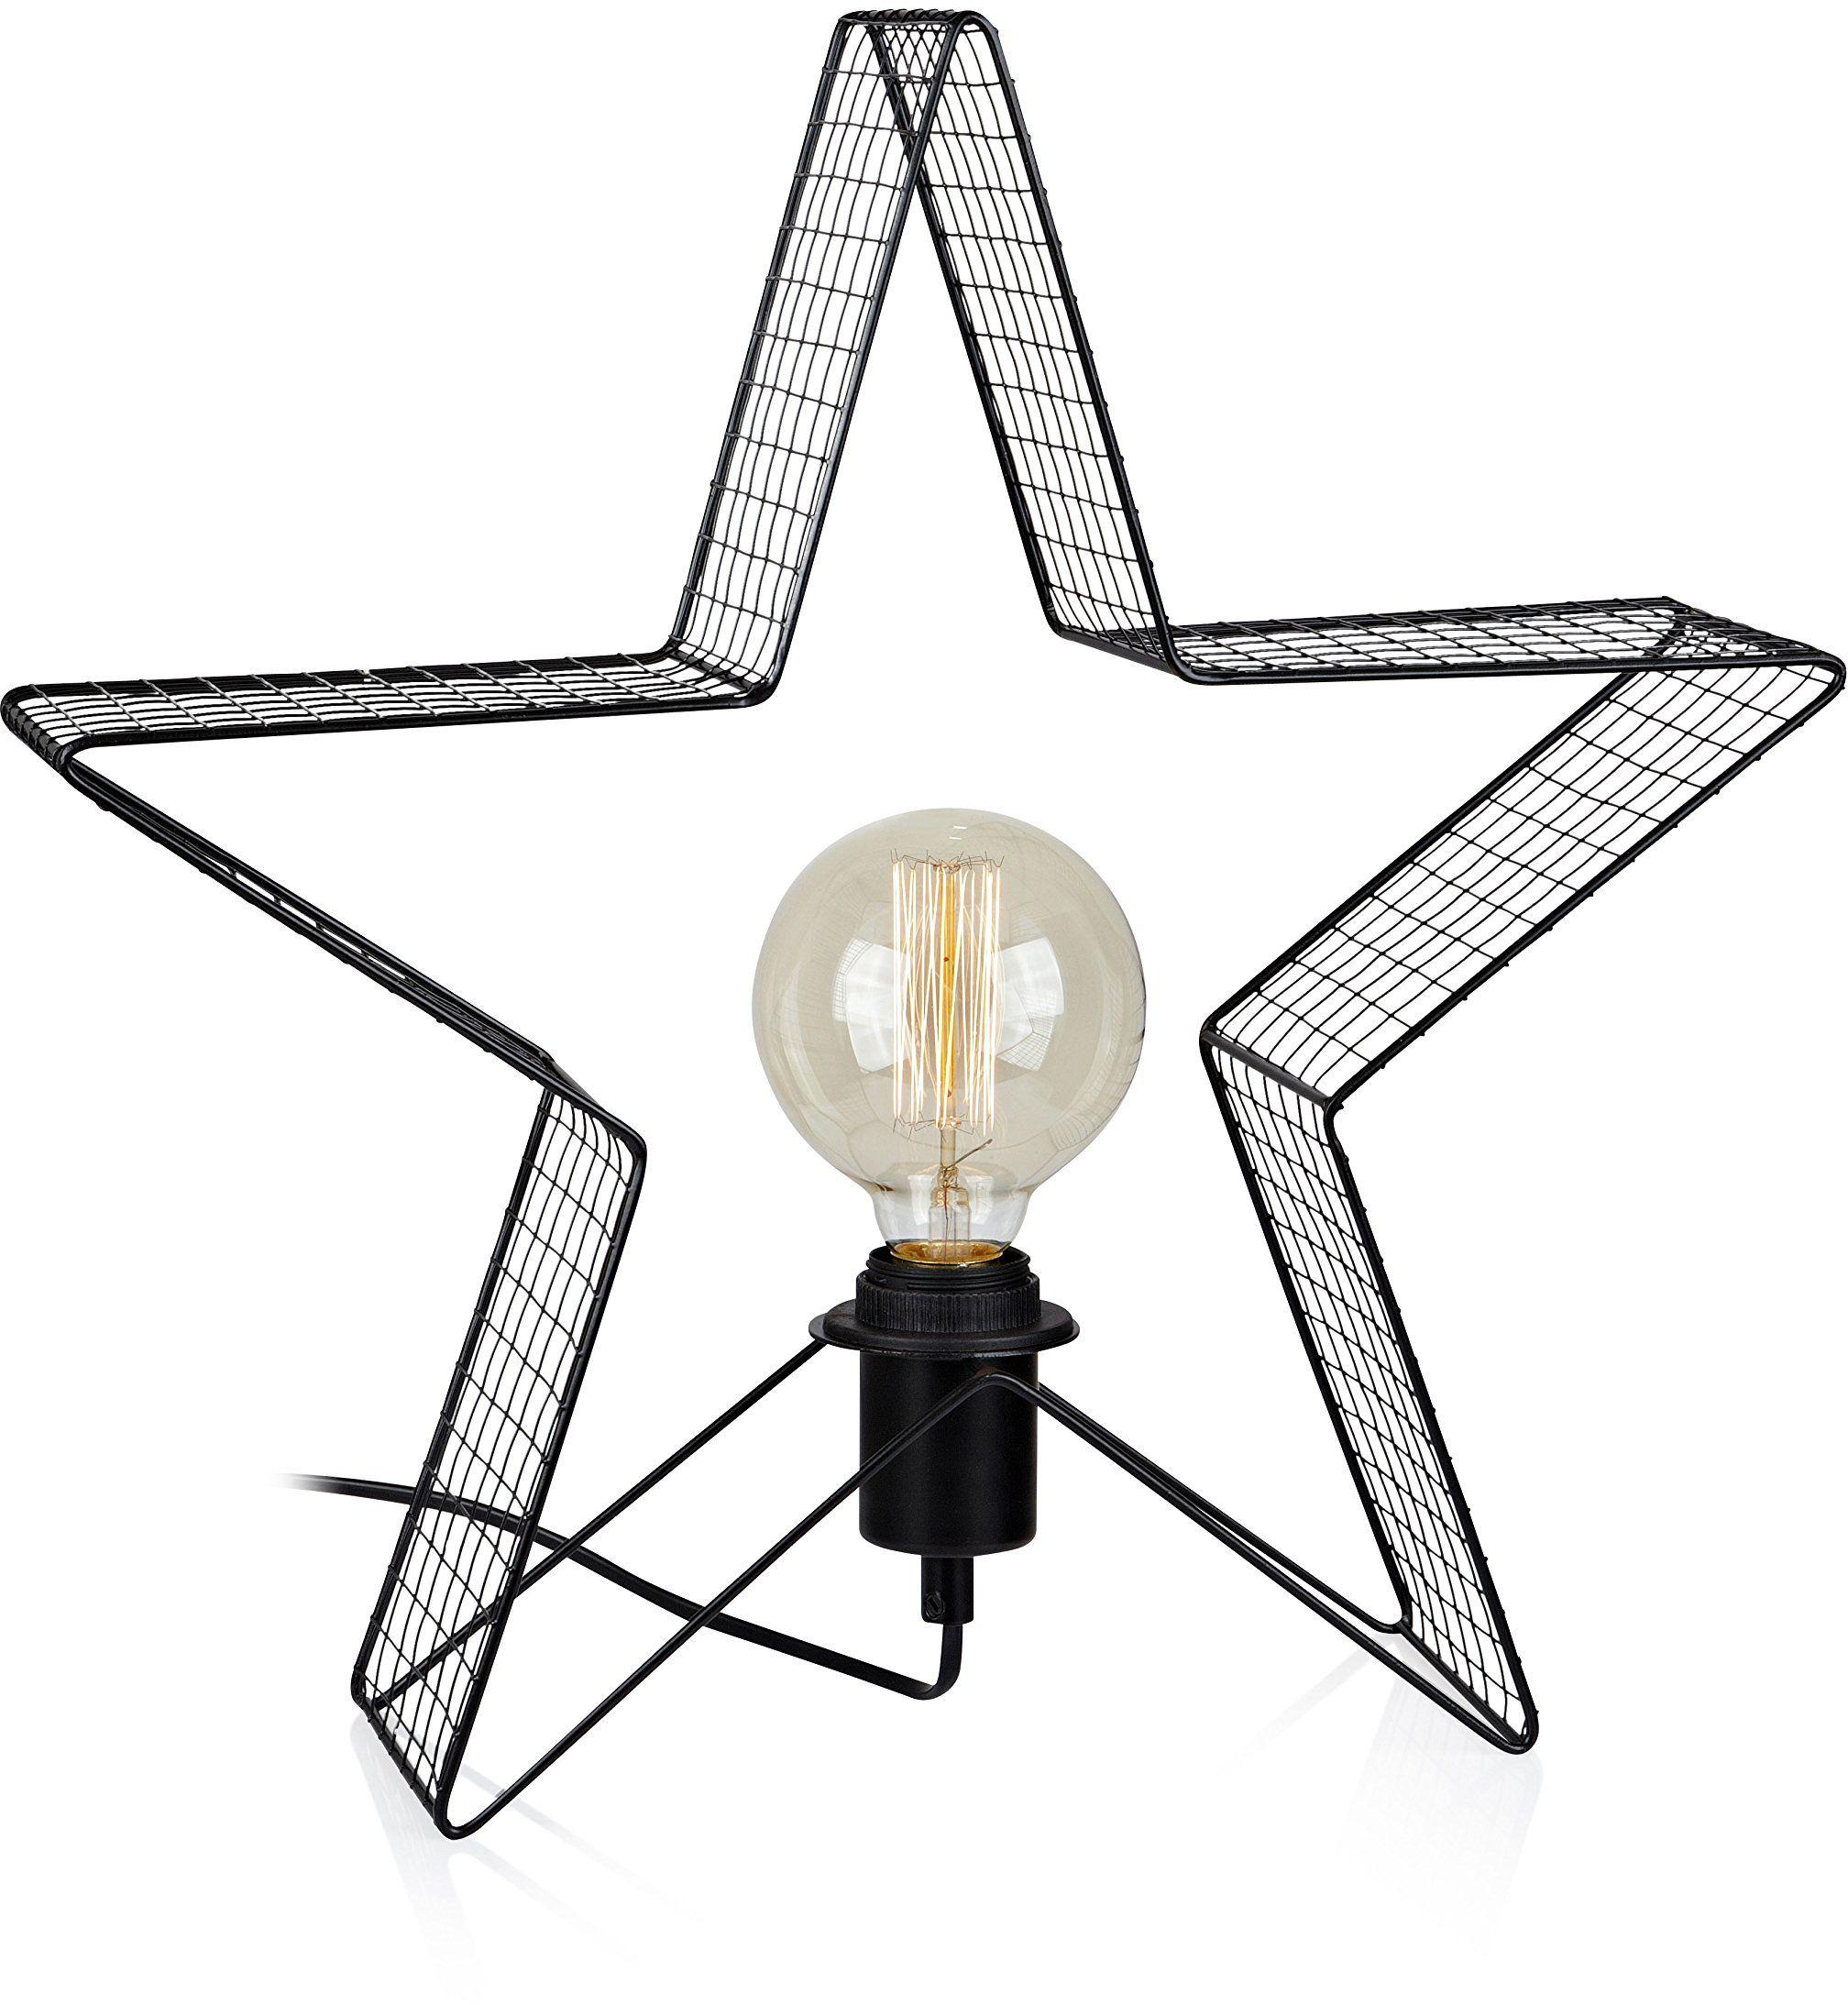 Markslöjd Lampa stołowa, metal, E27, czarna, 42,5 x 10,5 x 40,5 cm